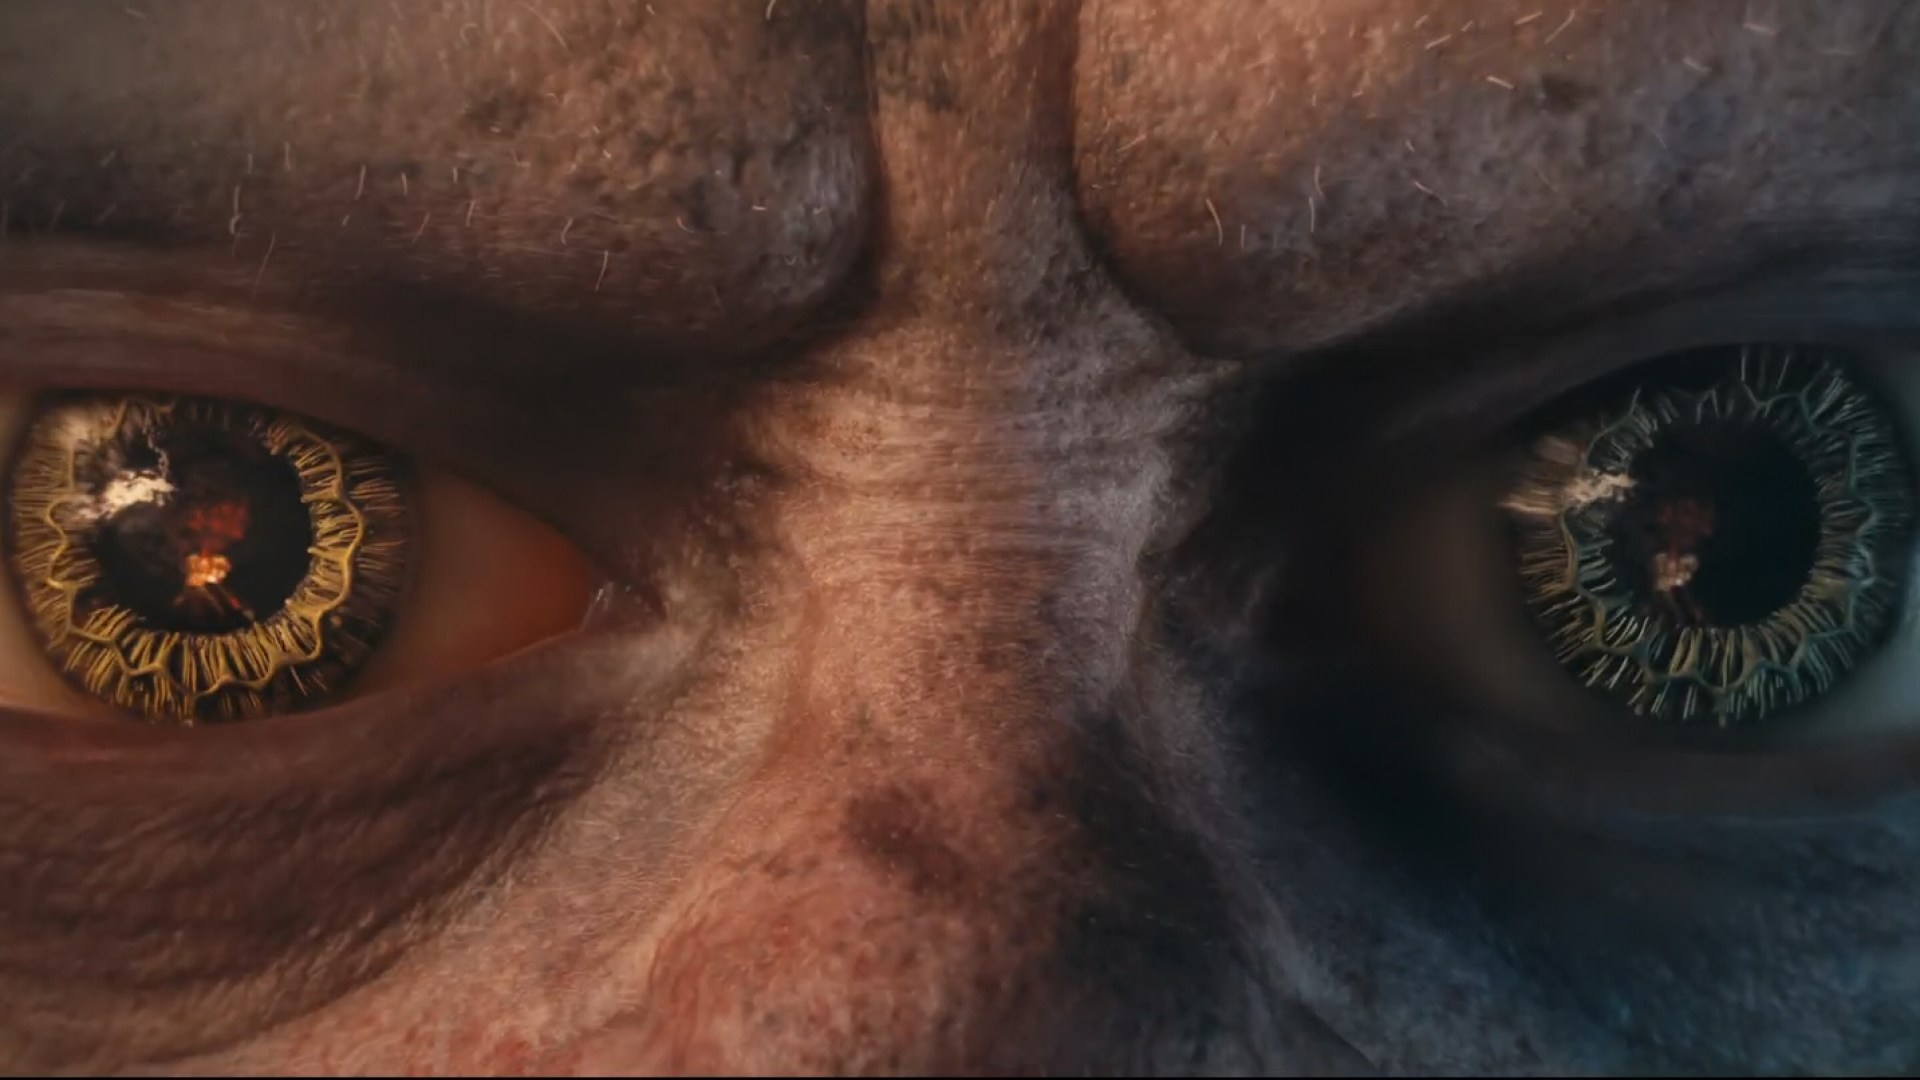 Trailer, Teaser, Der Herr der Ringe, Herr der Ringe, Daedalic Entertainment, Daedalic, Gollum